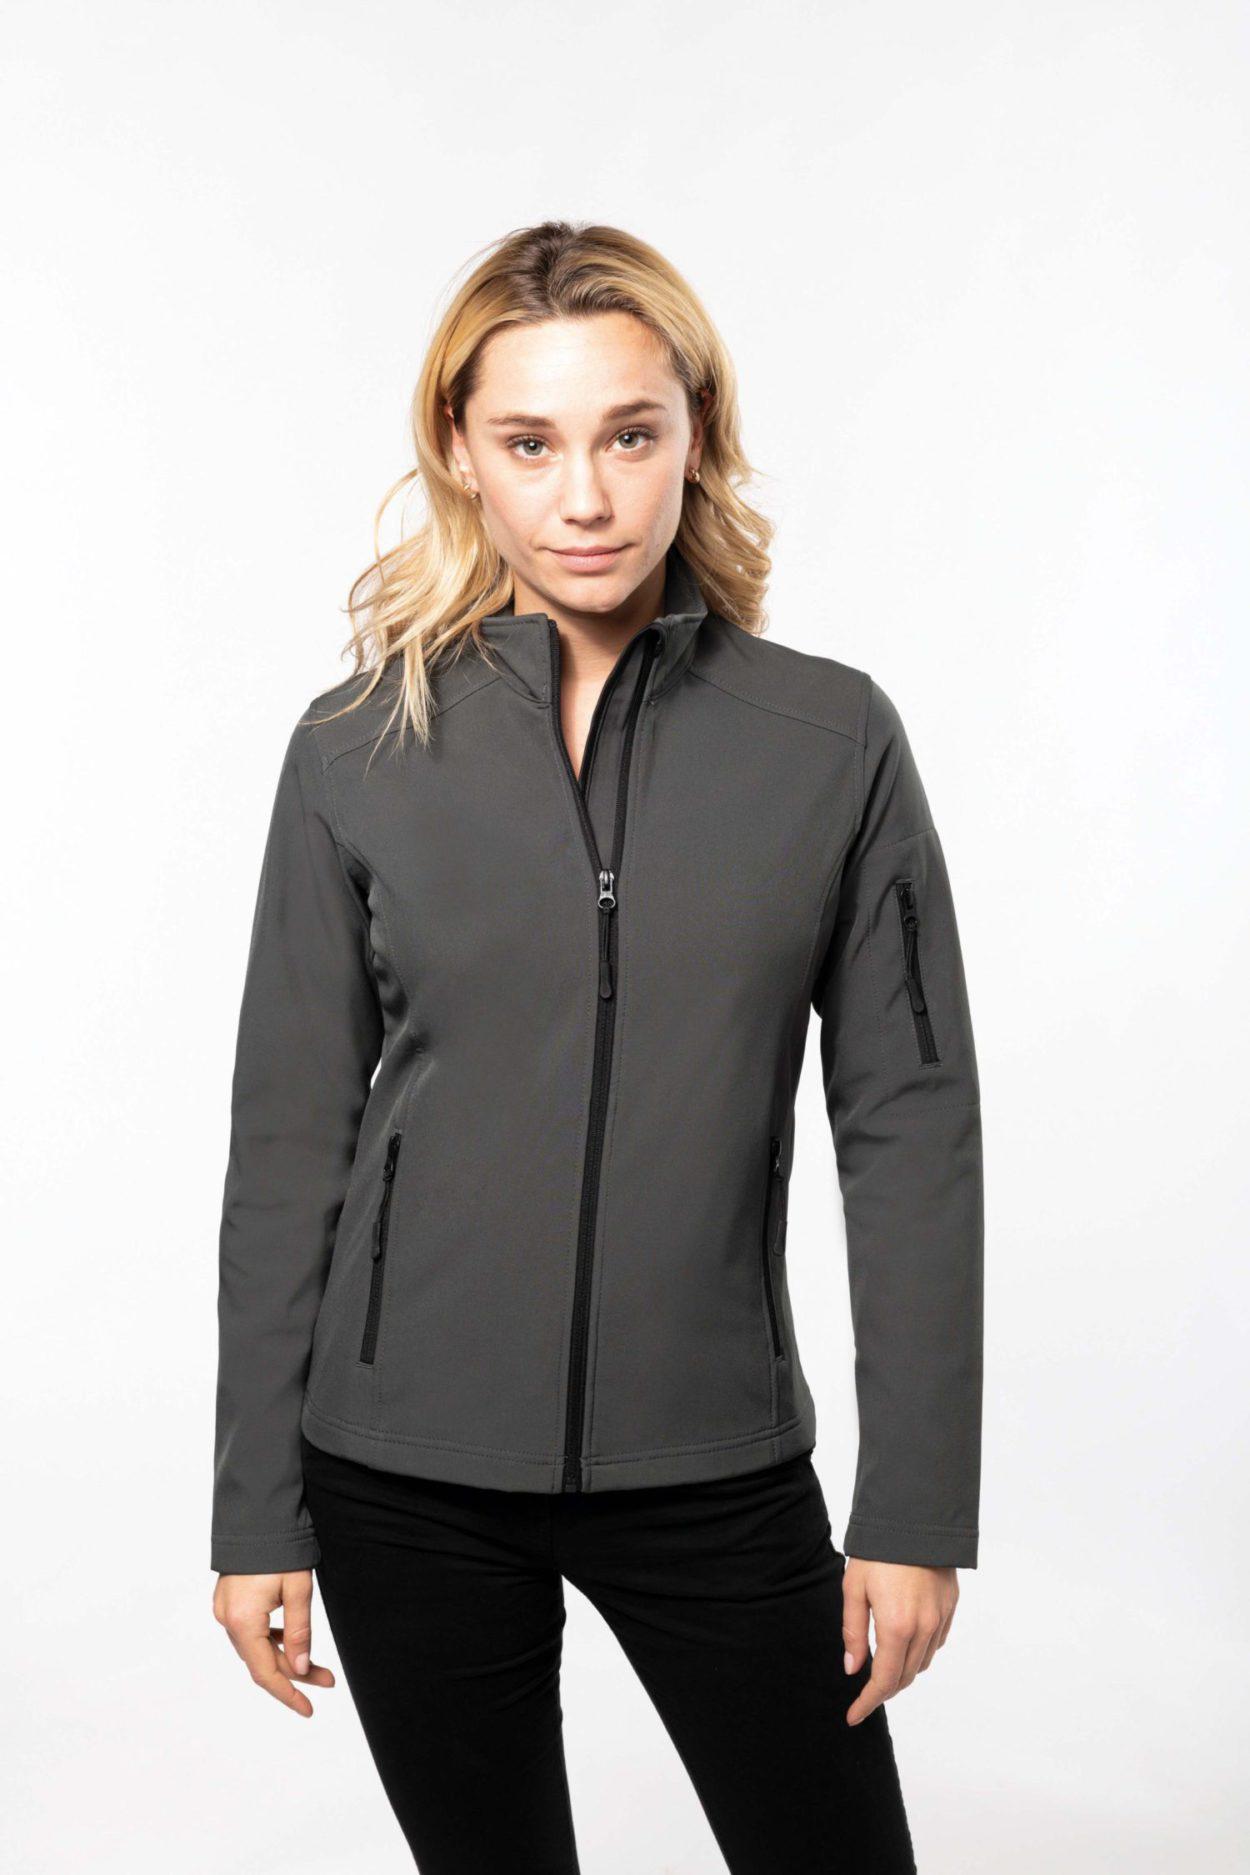 K400 Ladies Softshell Jacket Kariban Borduuratelier Pasprint